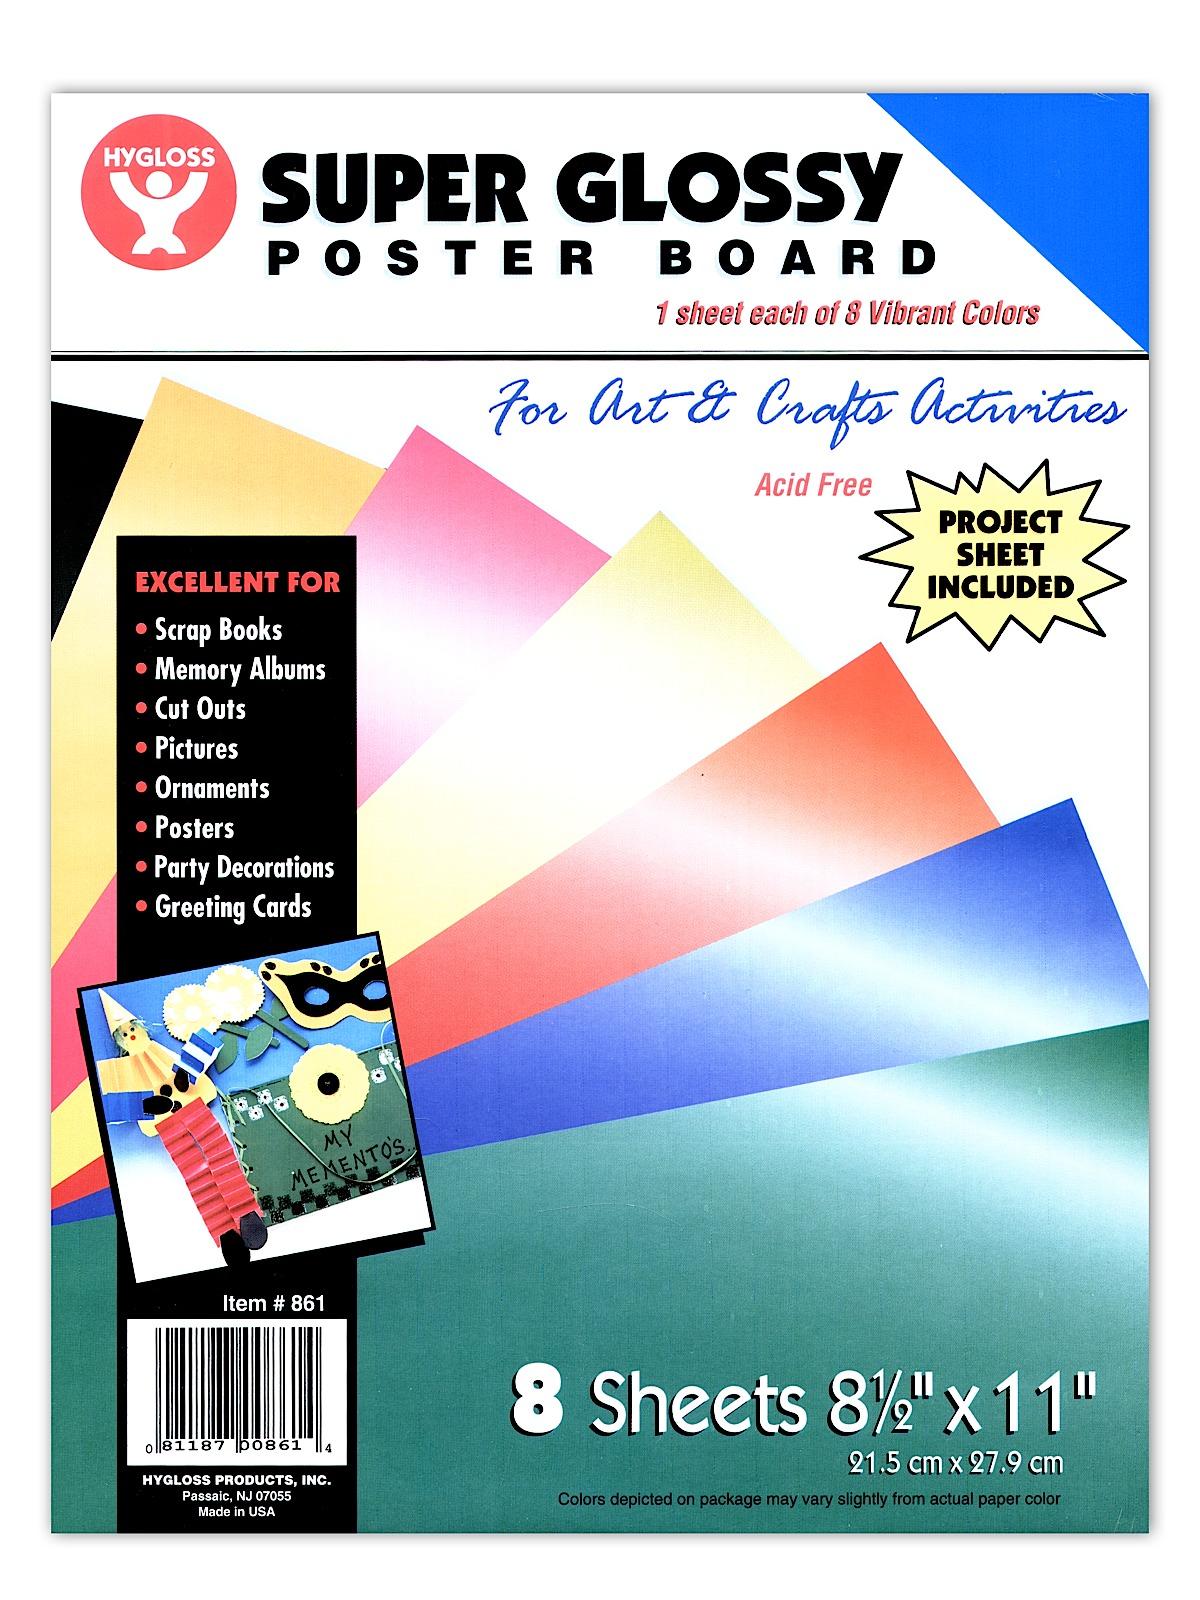 Hygloss Super Glossy Poster Board | MisterArt.com